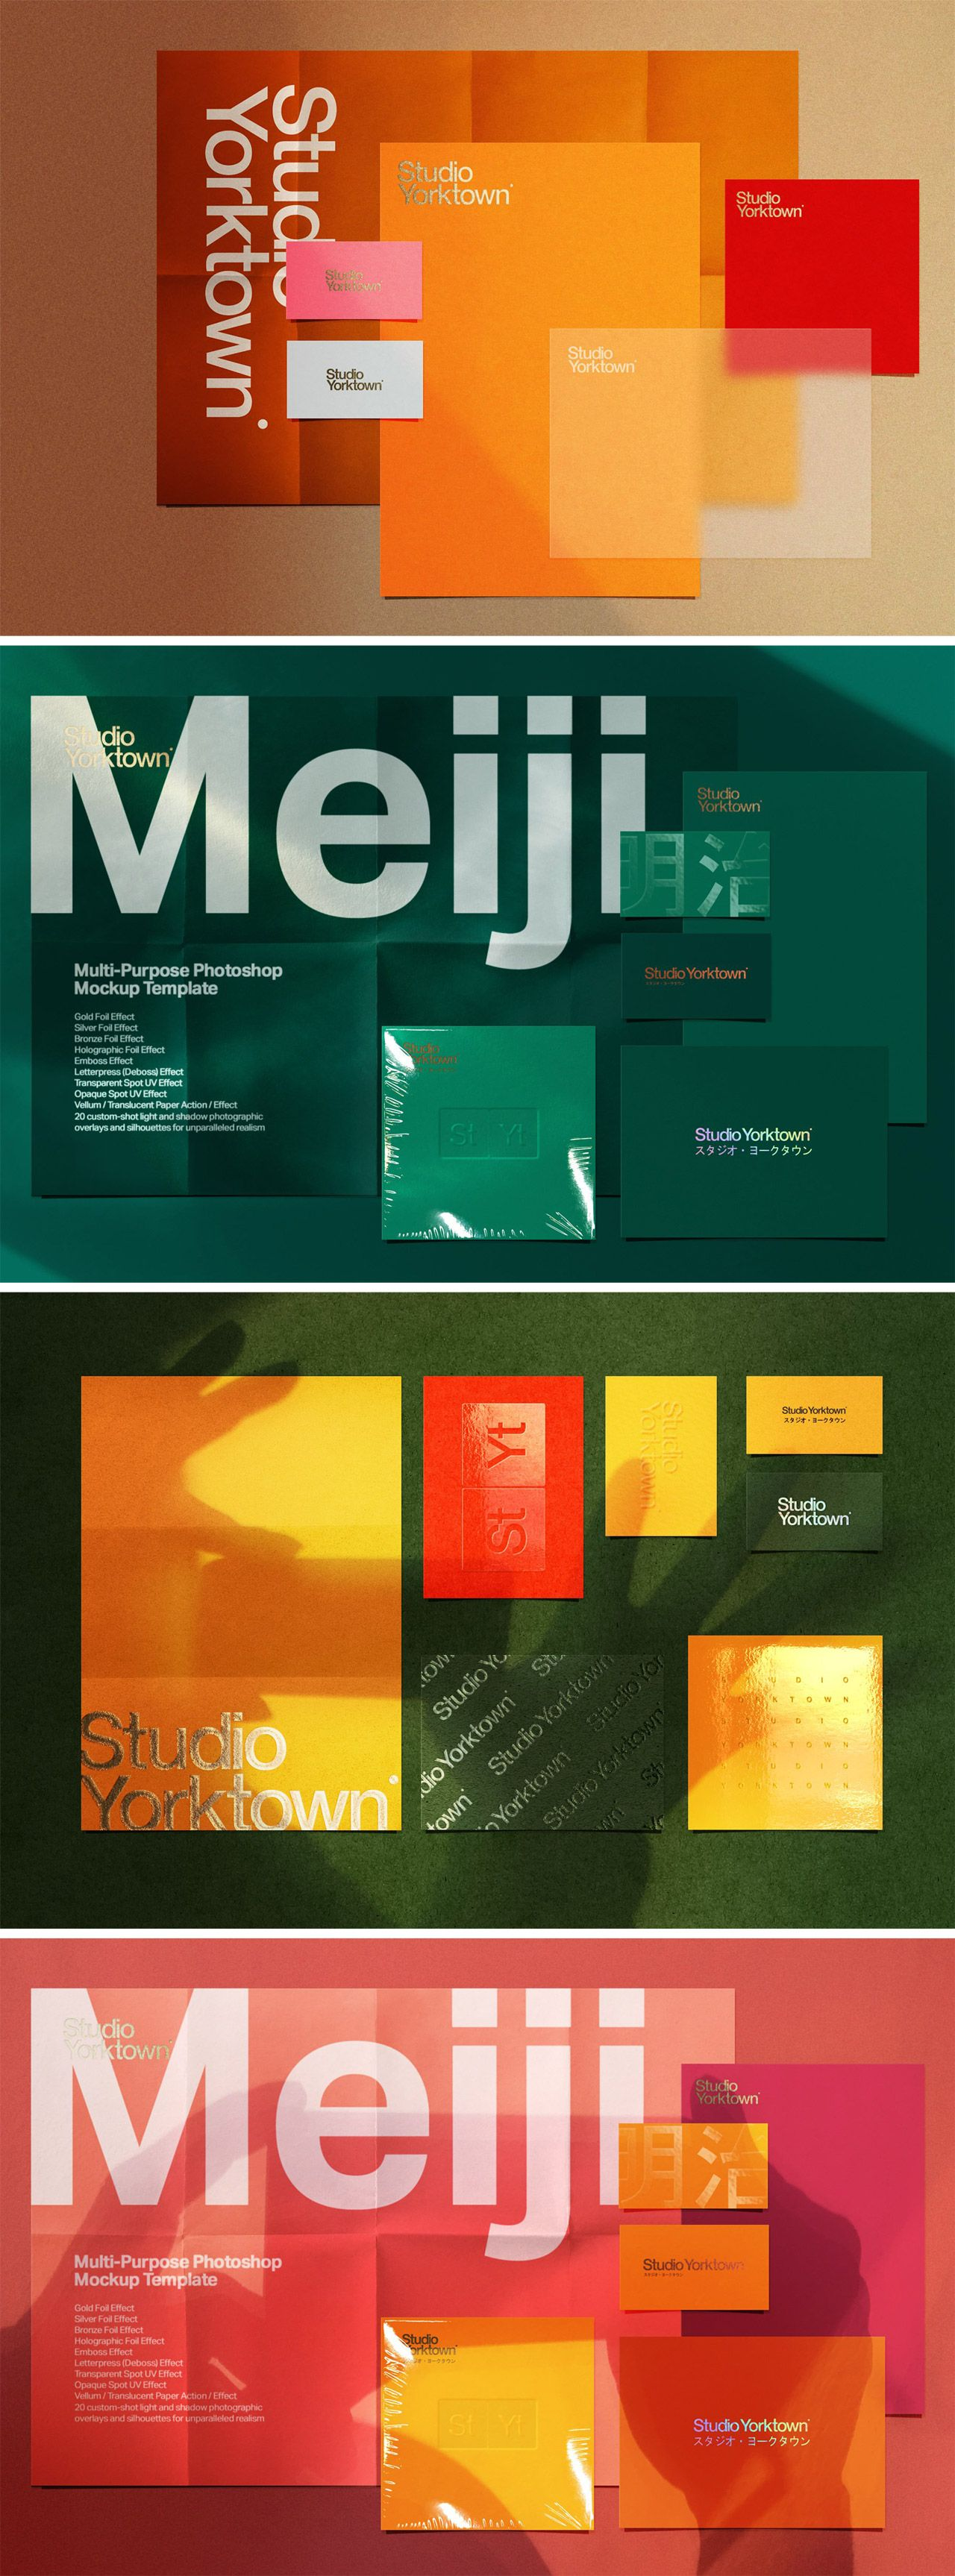 Meiji A Multi Print Effects Mockup Adobe Photoshop Templates By Studio Yorktown Book Design Layout Photoshop Template Simple Logo Design